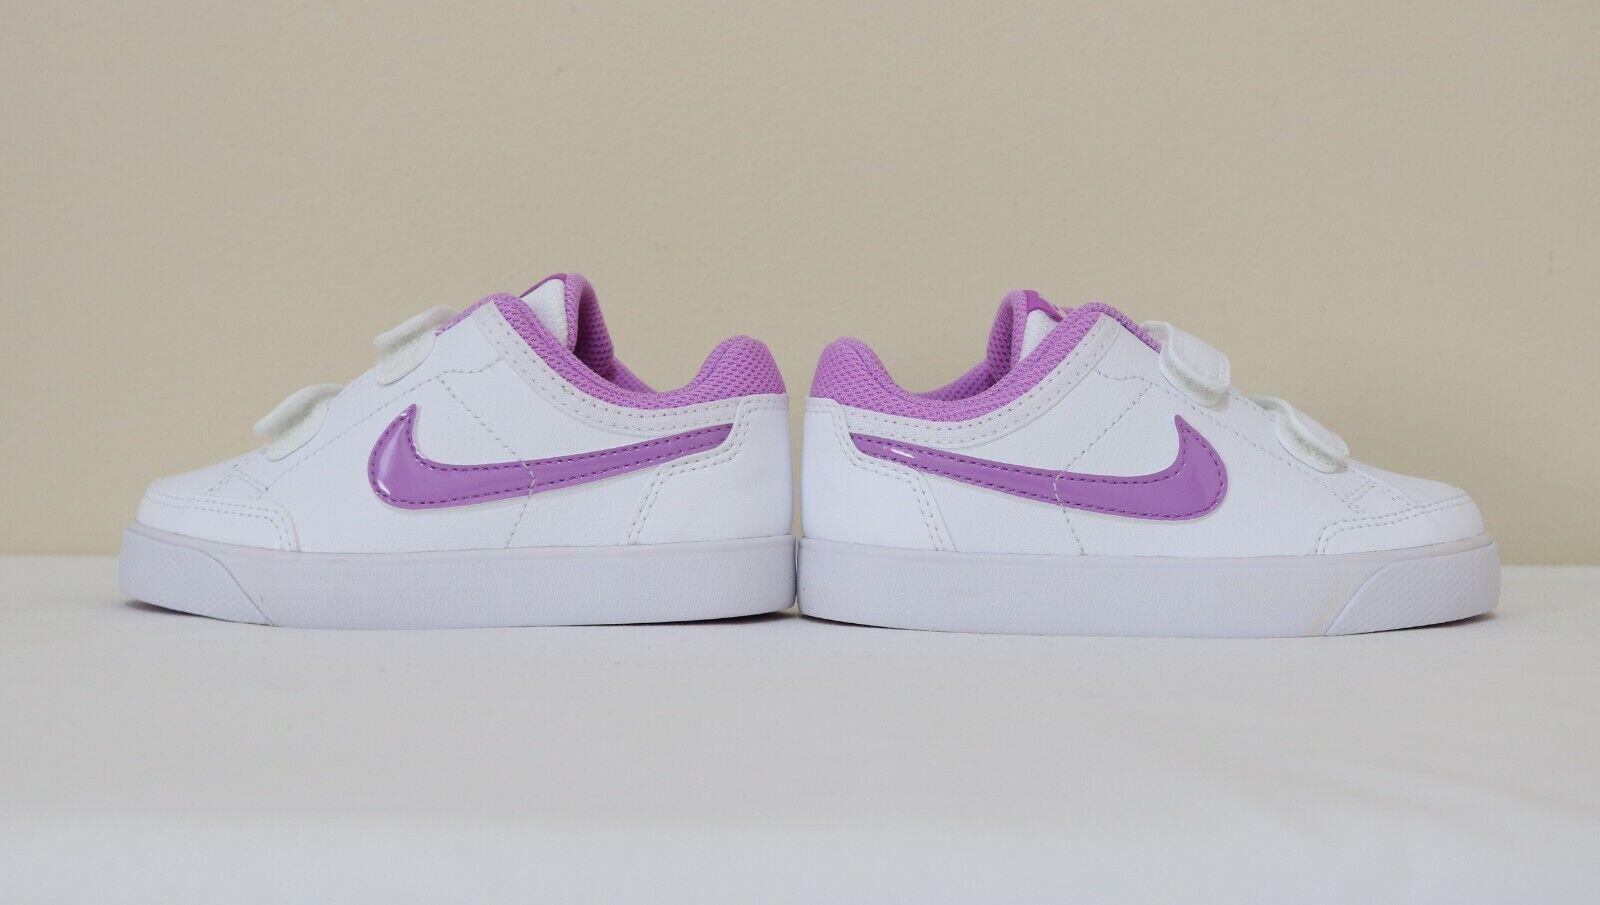 Nike Baby Girls Capri 3 LTR (TDV) sneaker shoes Size 7 ,8, 9 new with box 1